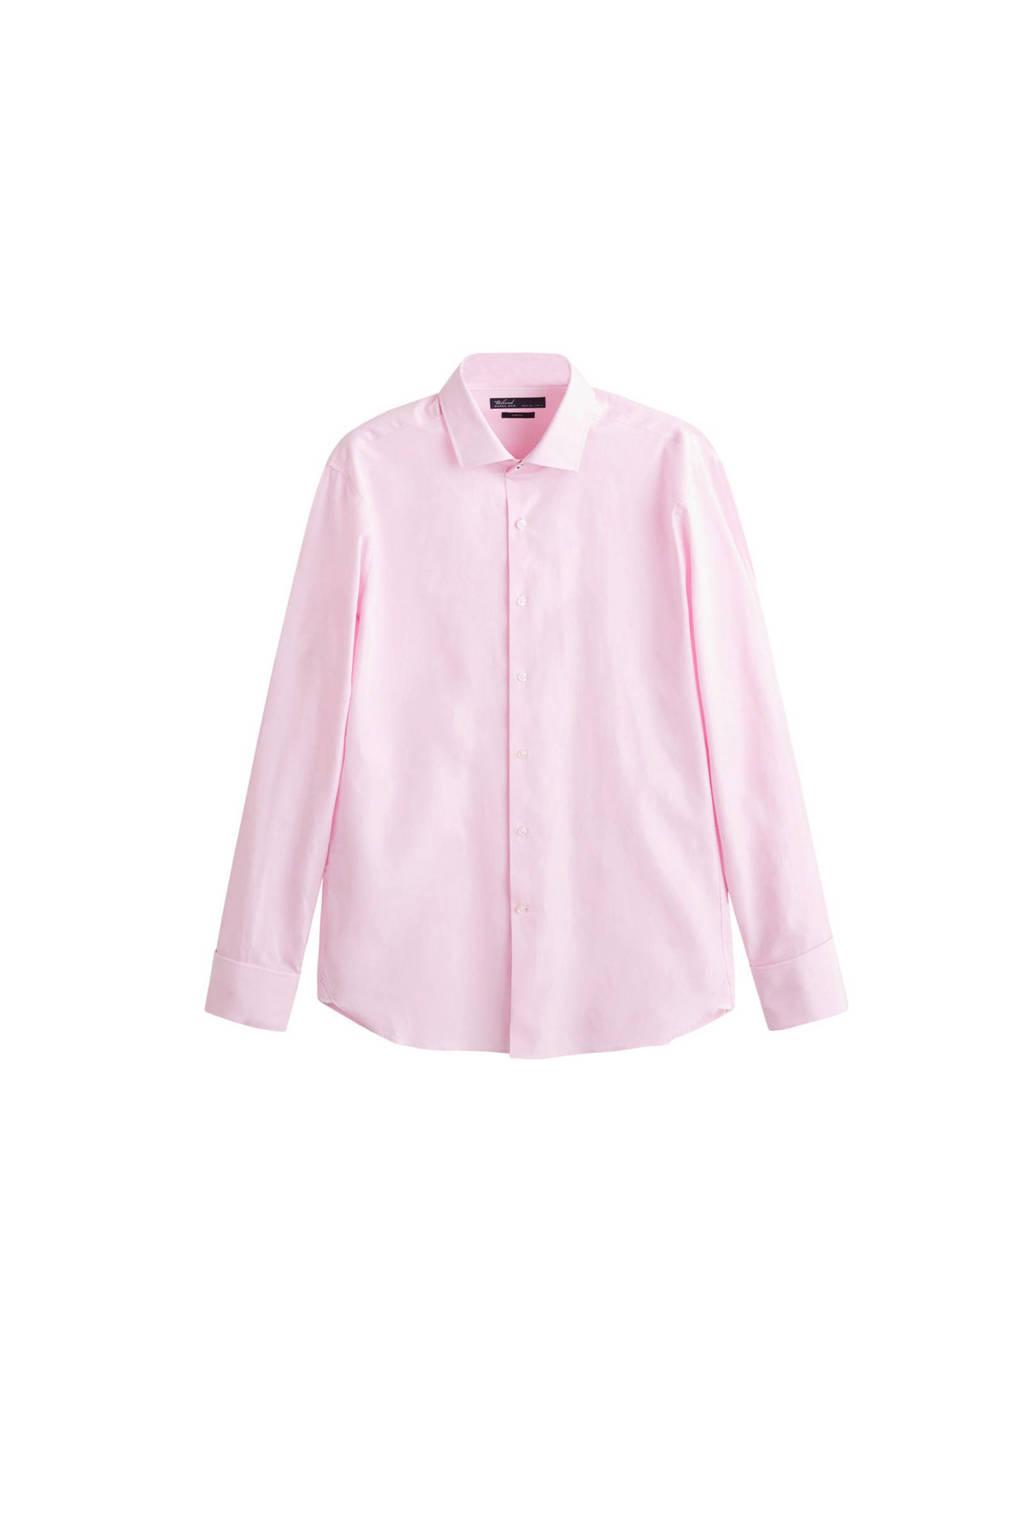 Mango Man overhemd slim fit, Roze